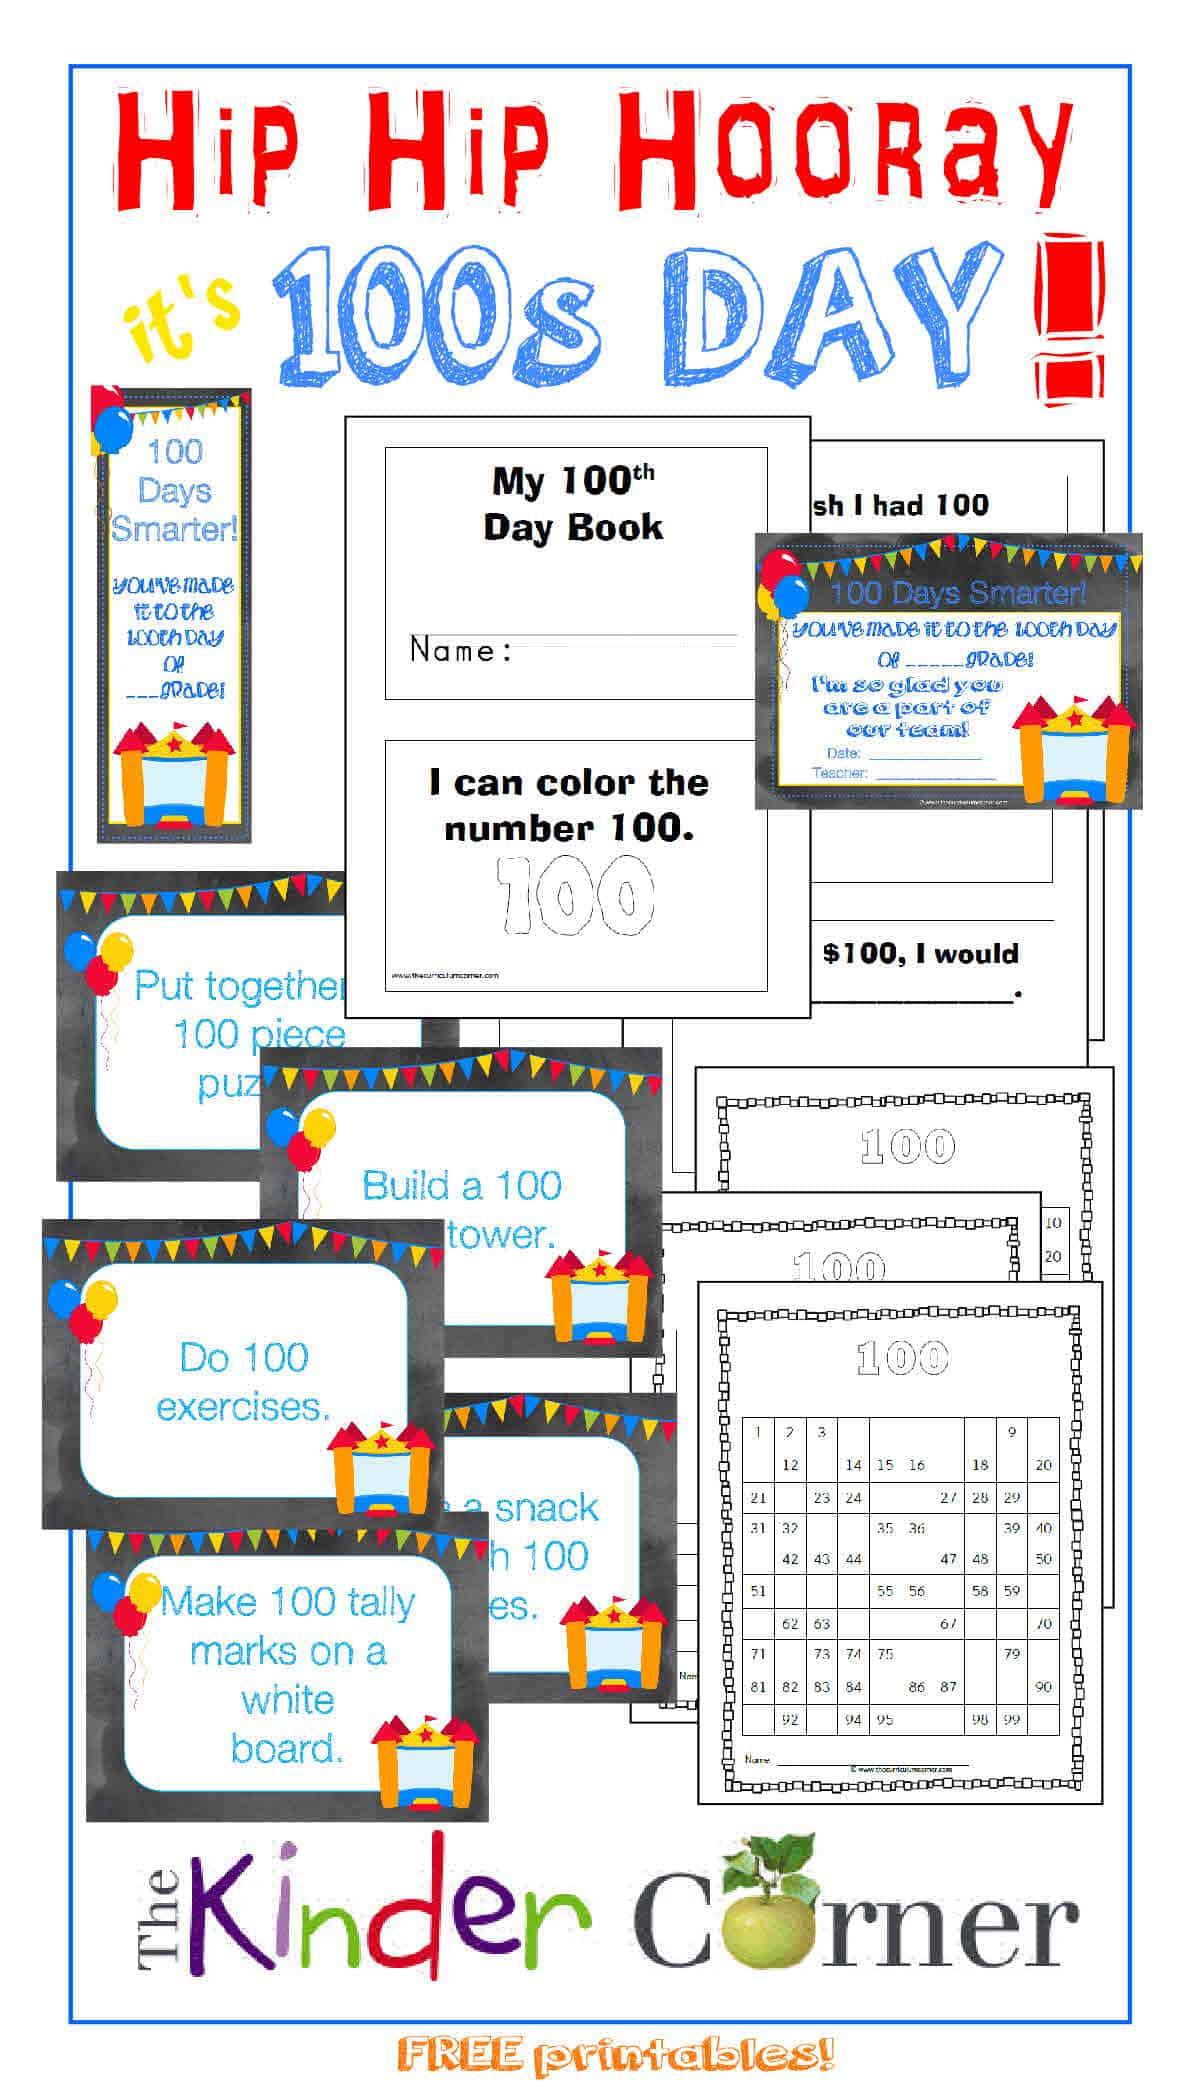 Hip, Hip, Hooray!  It's 100s Day!